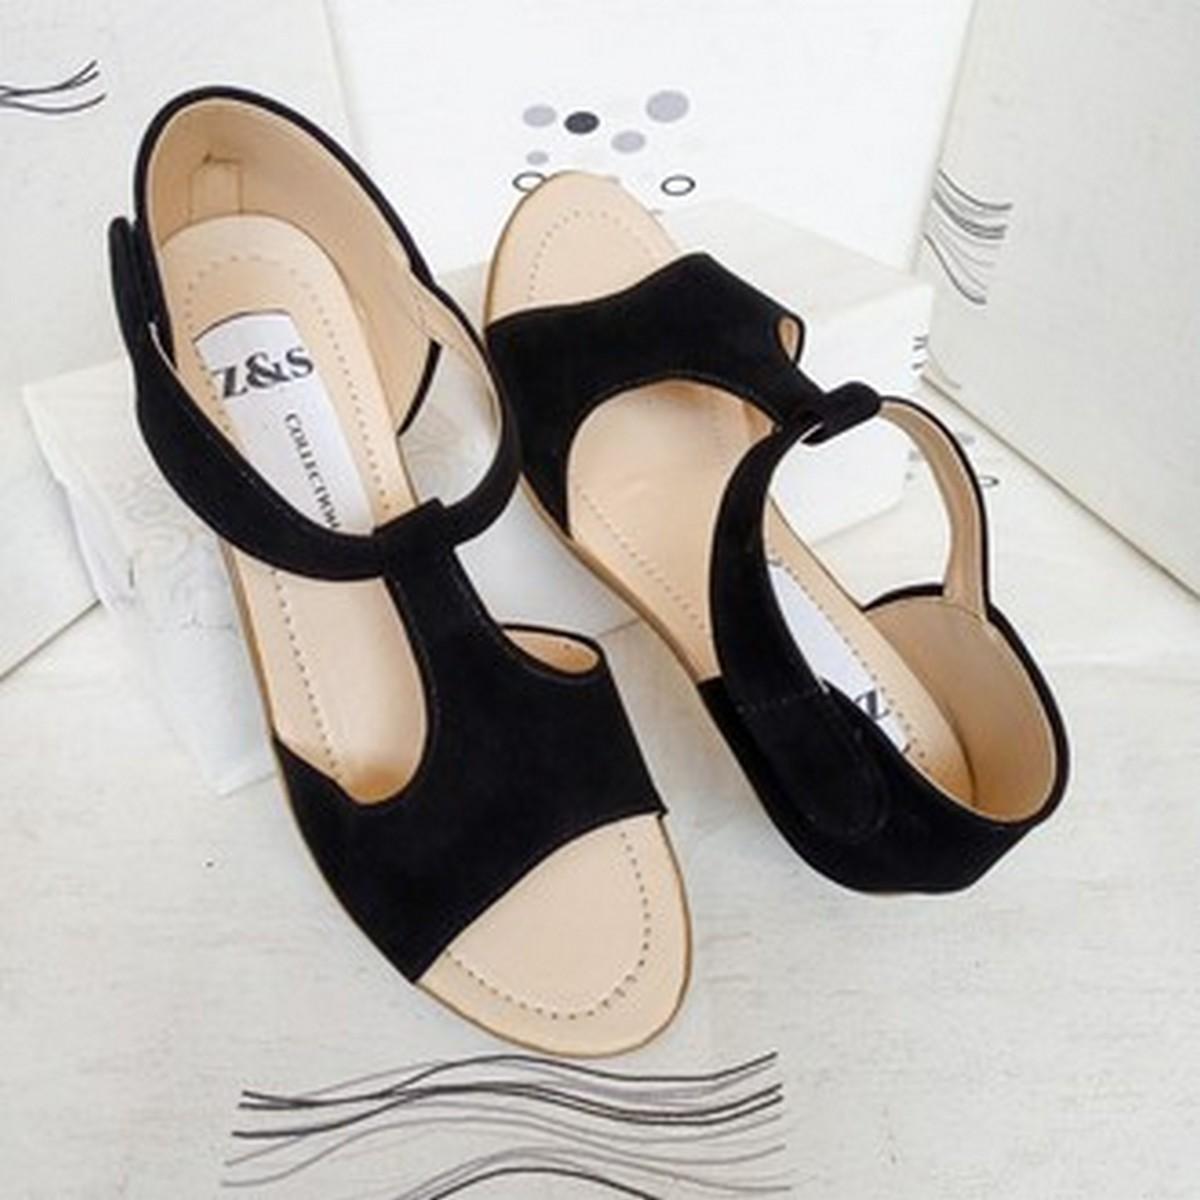 Medium Heel For Girls And Women